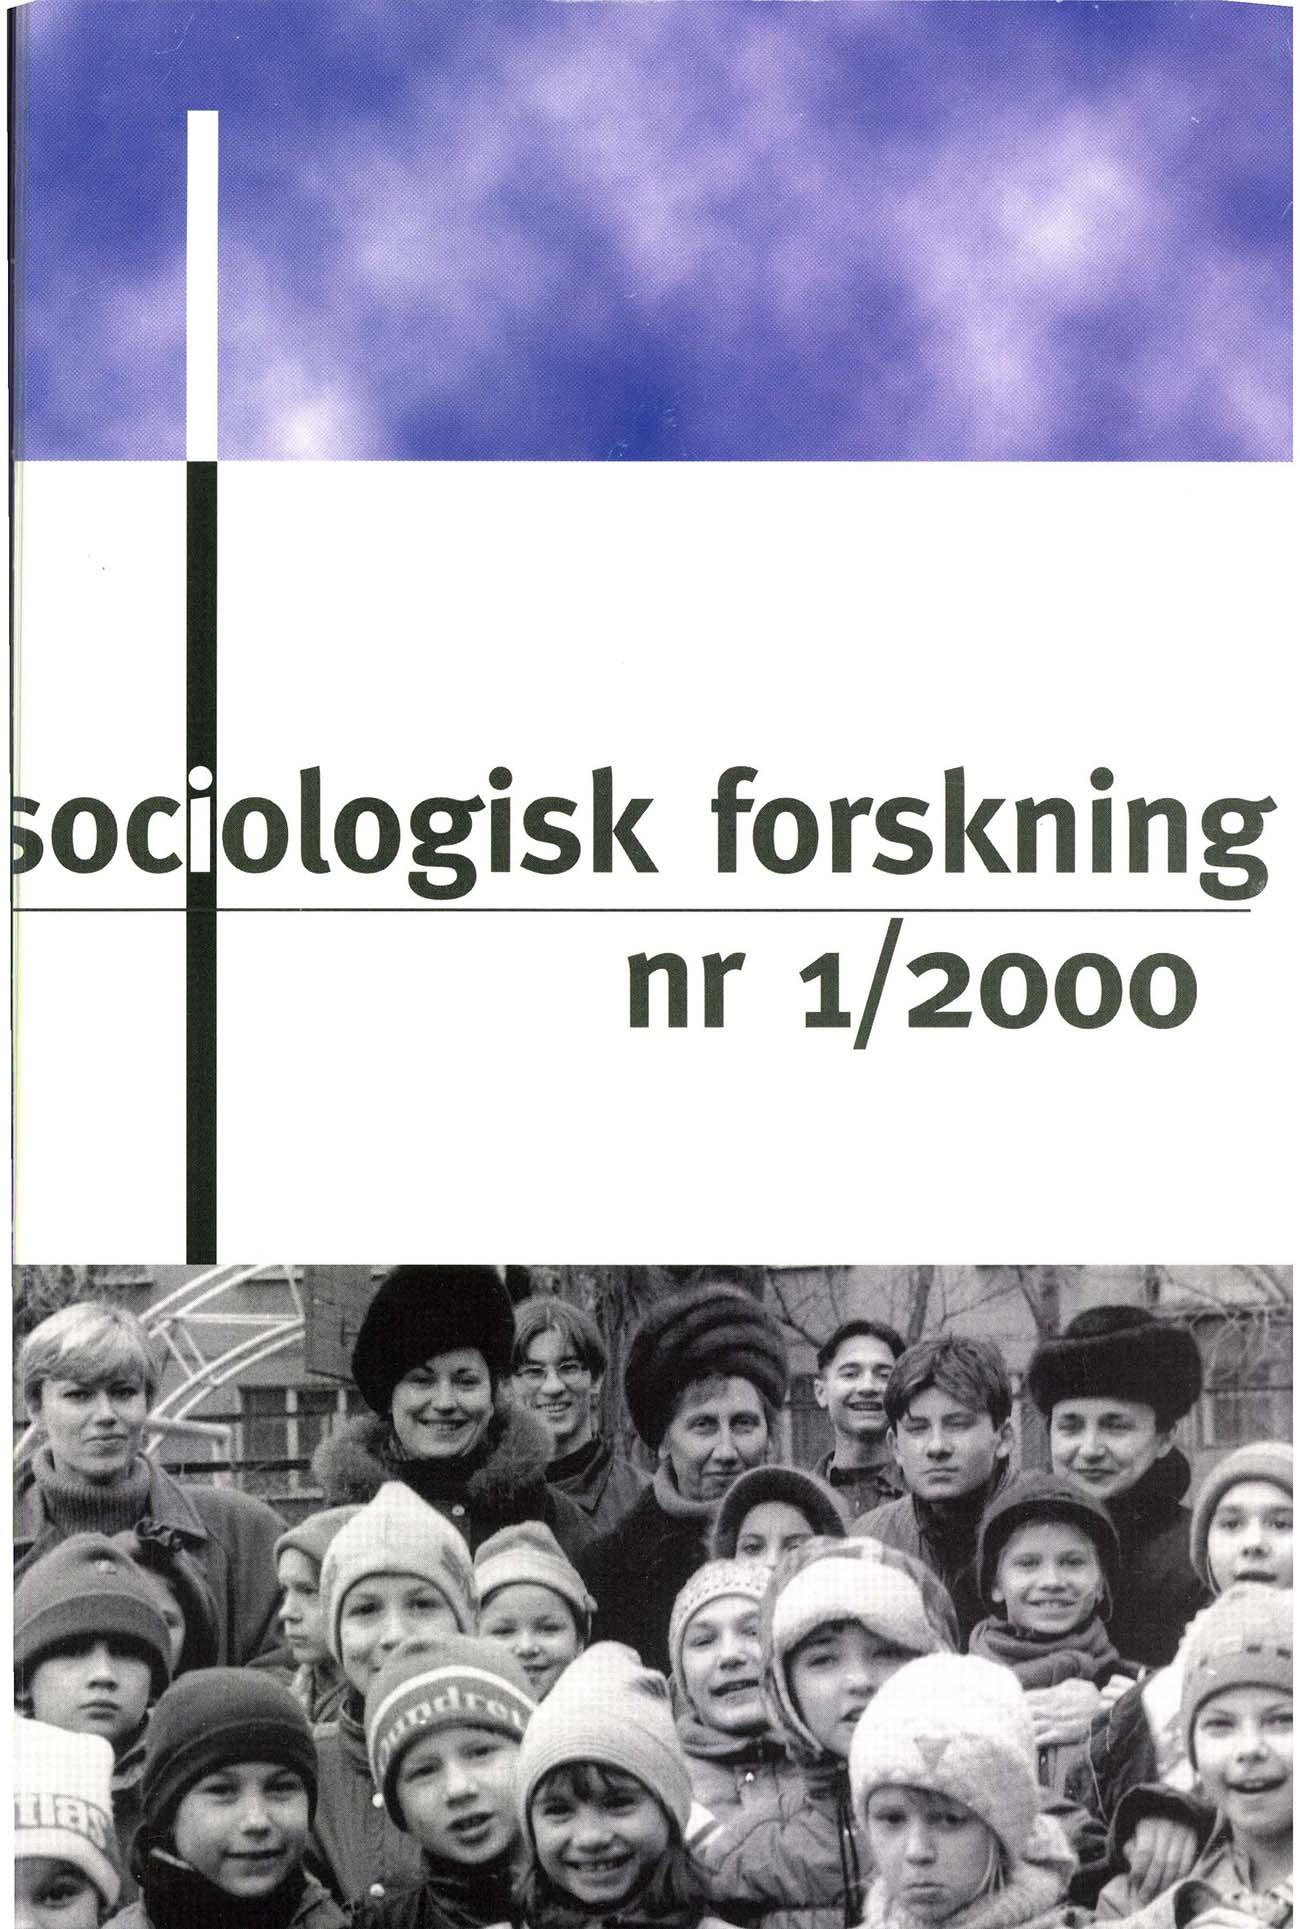 Visa Vol 37 Nr 1 (2000)